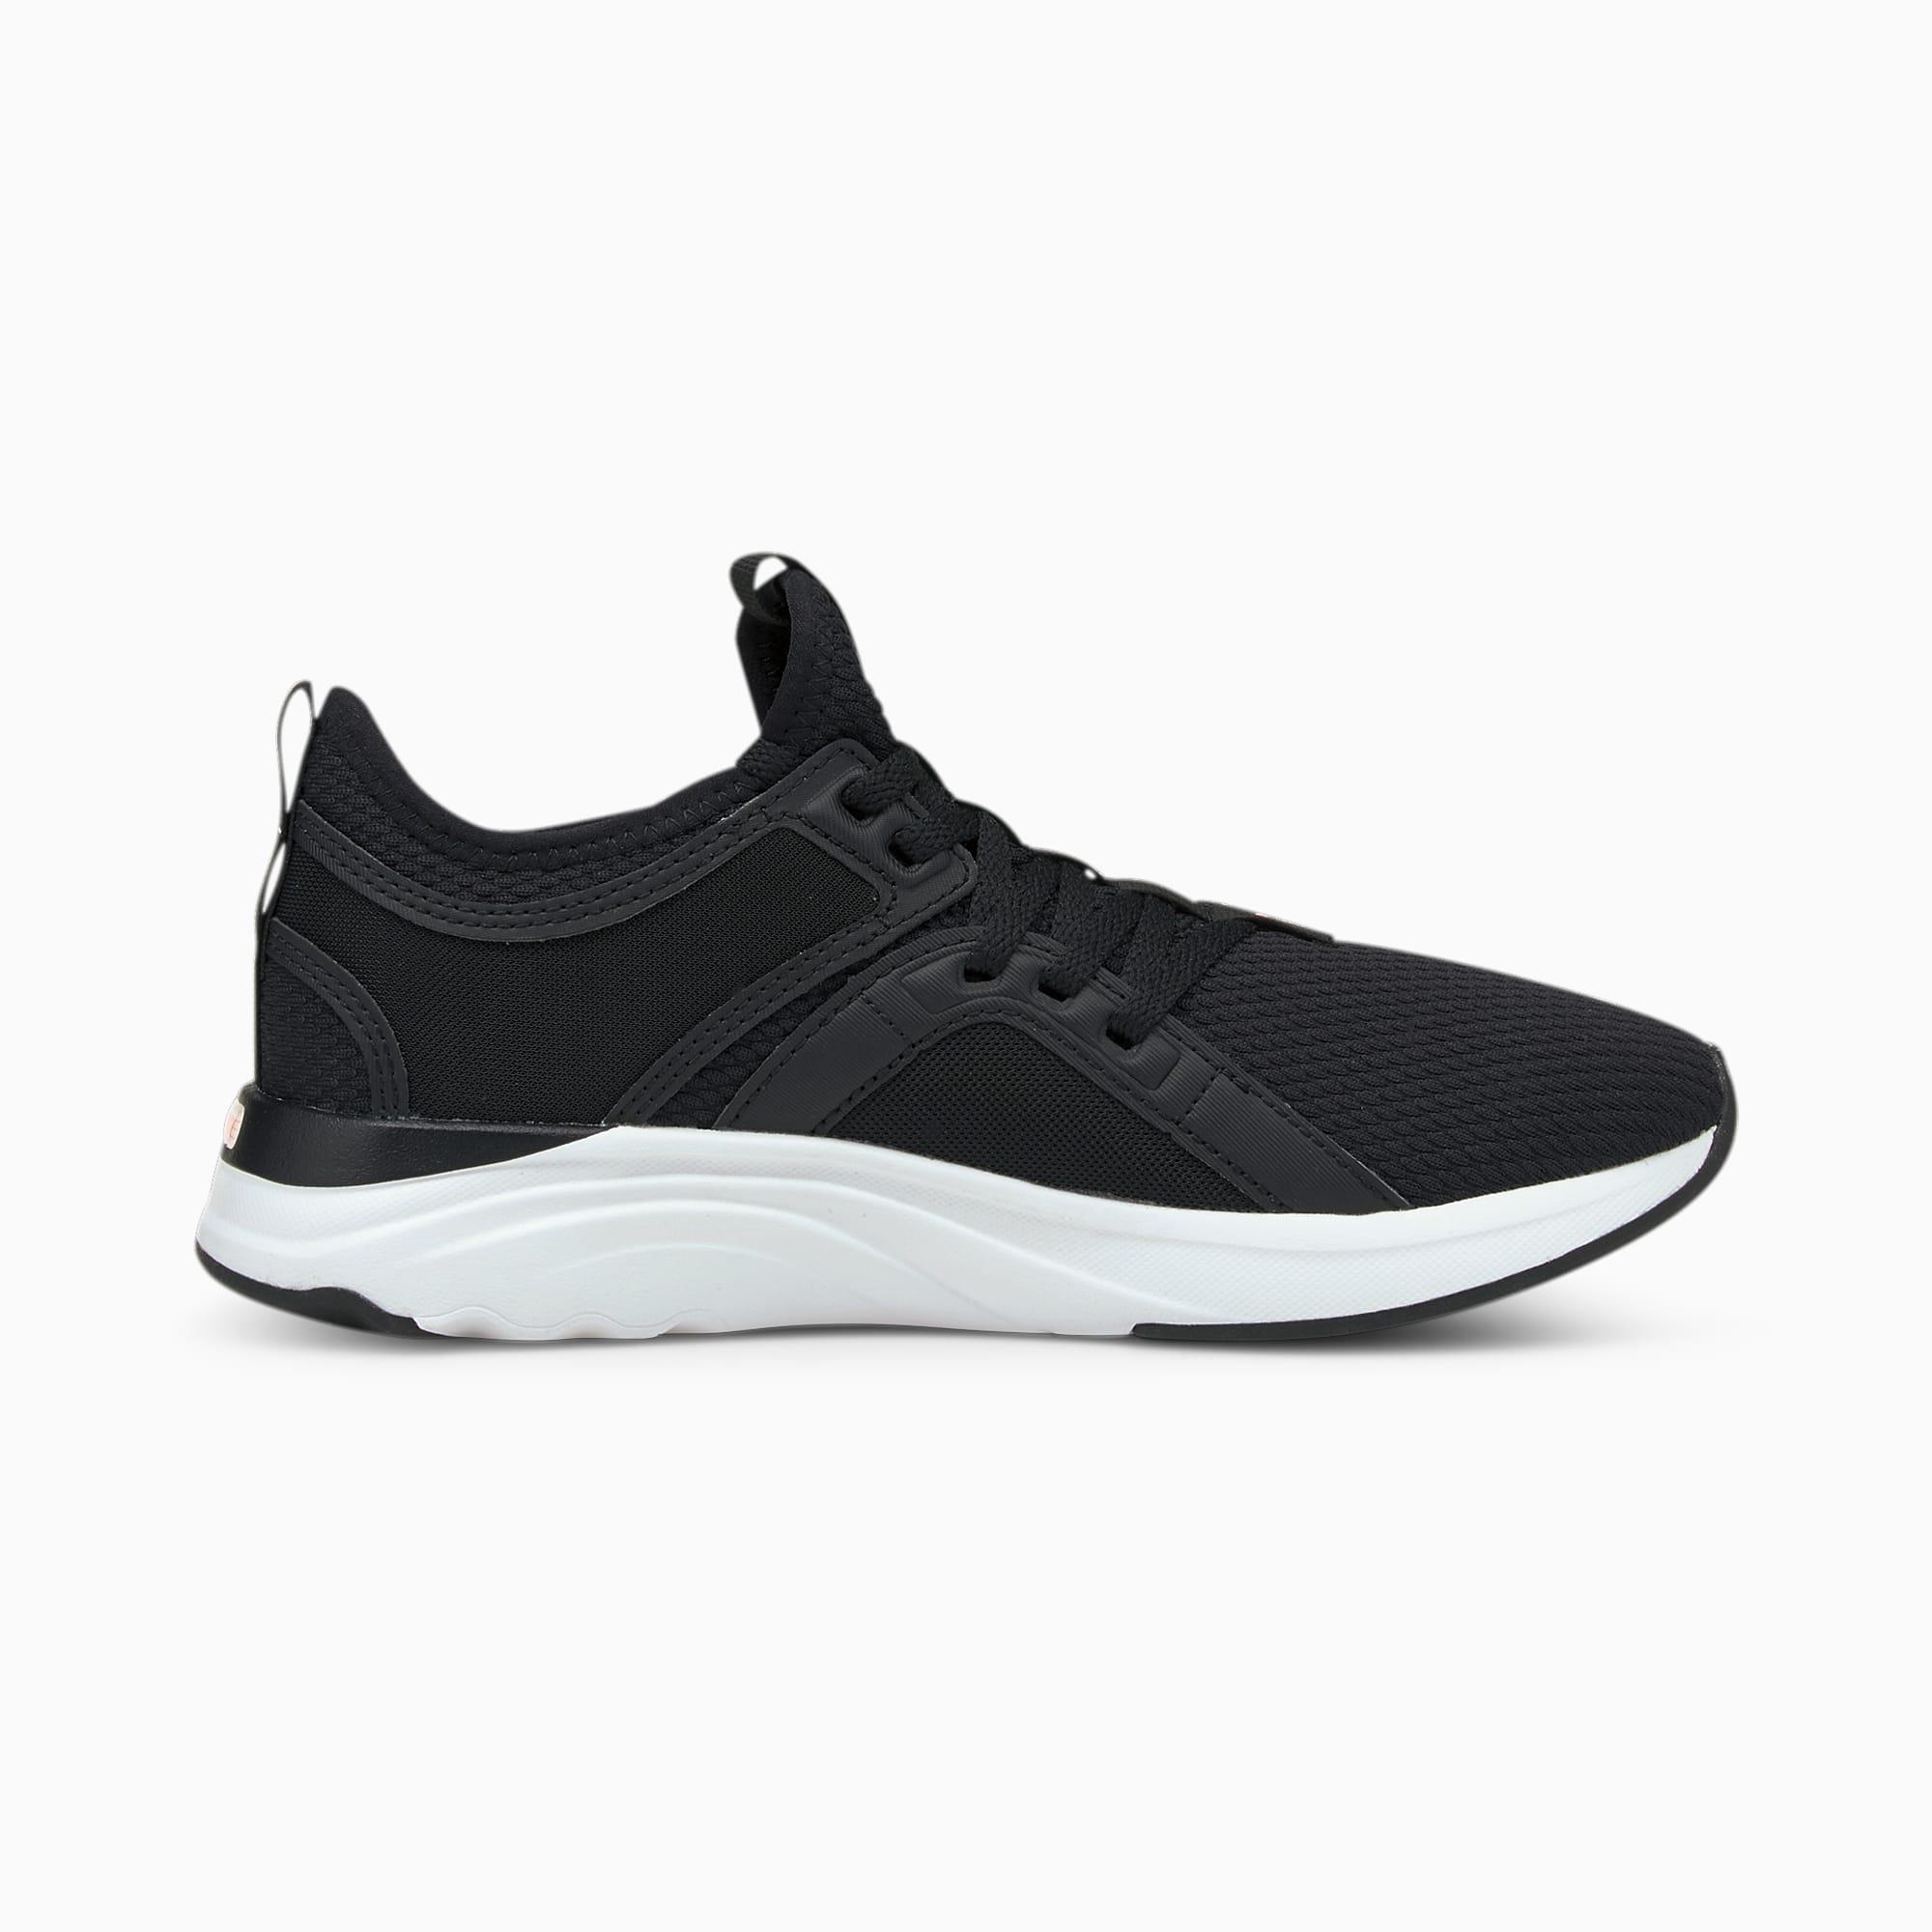 SoftRide Sophia Women's Running Shoes